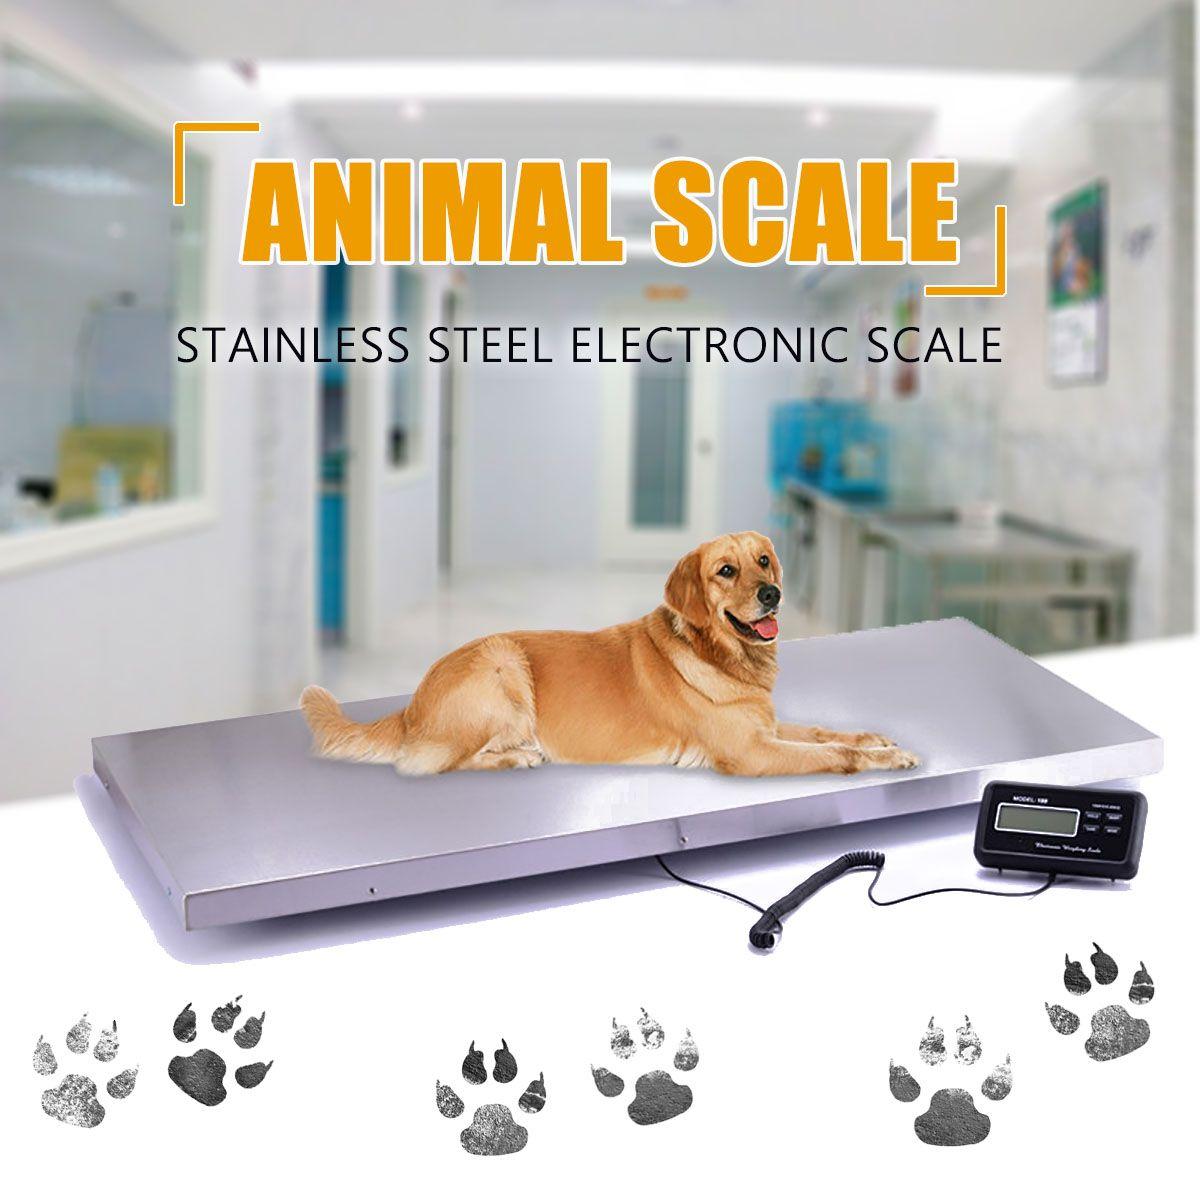 Schwere Elektronische Balance Boden Bench Gewicht Kommerziellen Waagen Digitale Plattform Waagen Tier/Paket Plattform Skala 300 kg